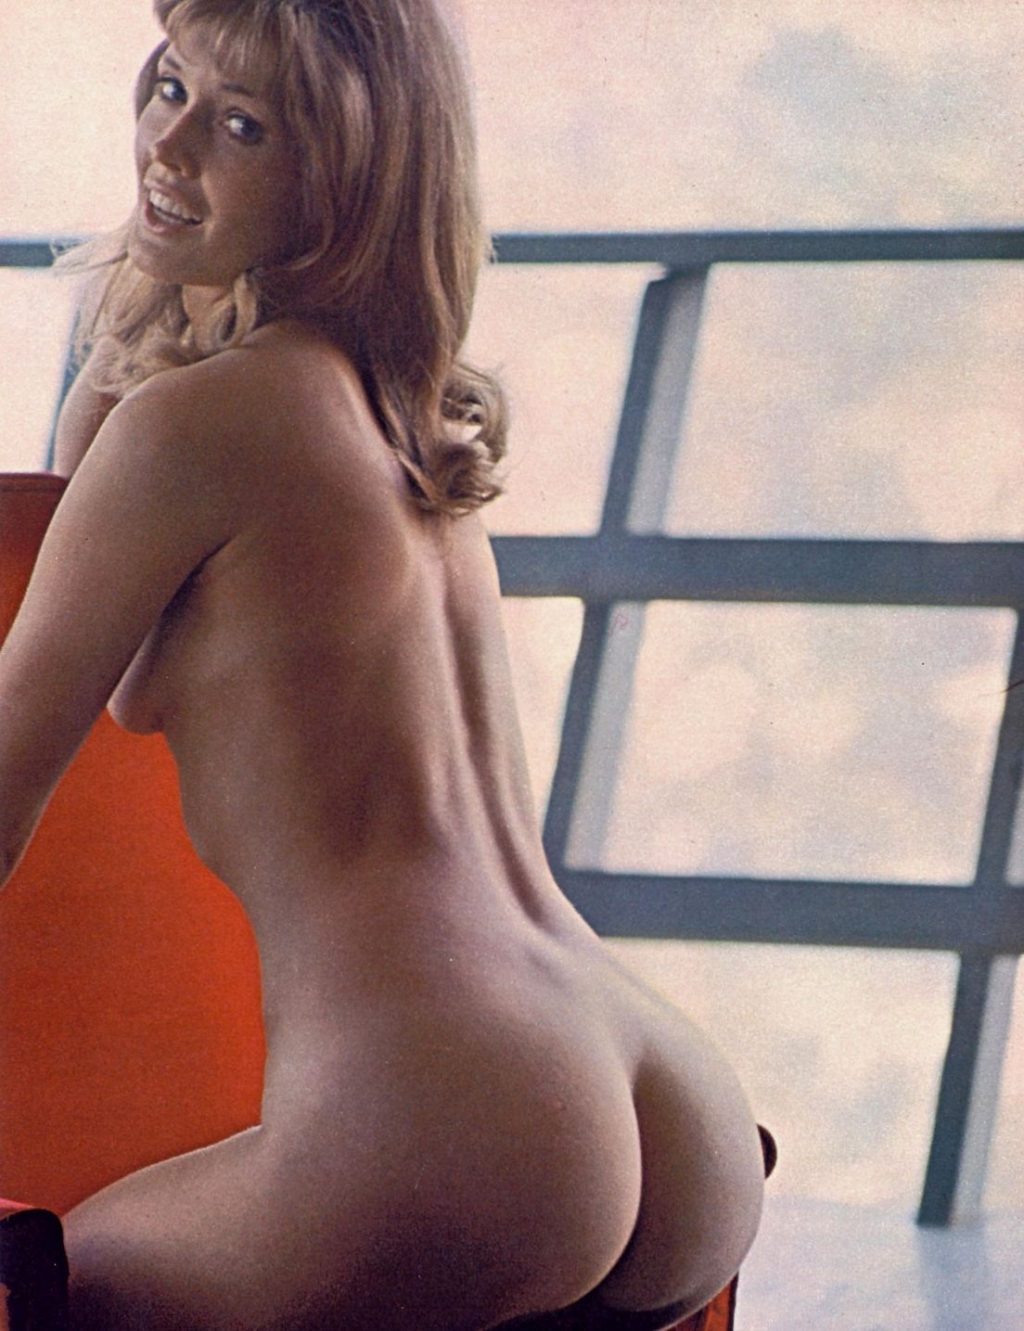 Sharon tate's secret life of orgies, threesomes and homemade sex pics